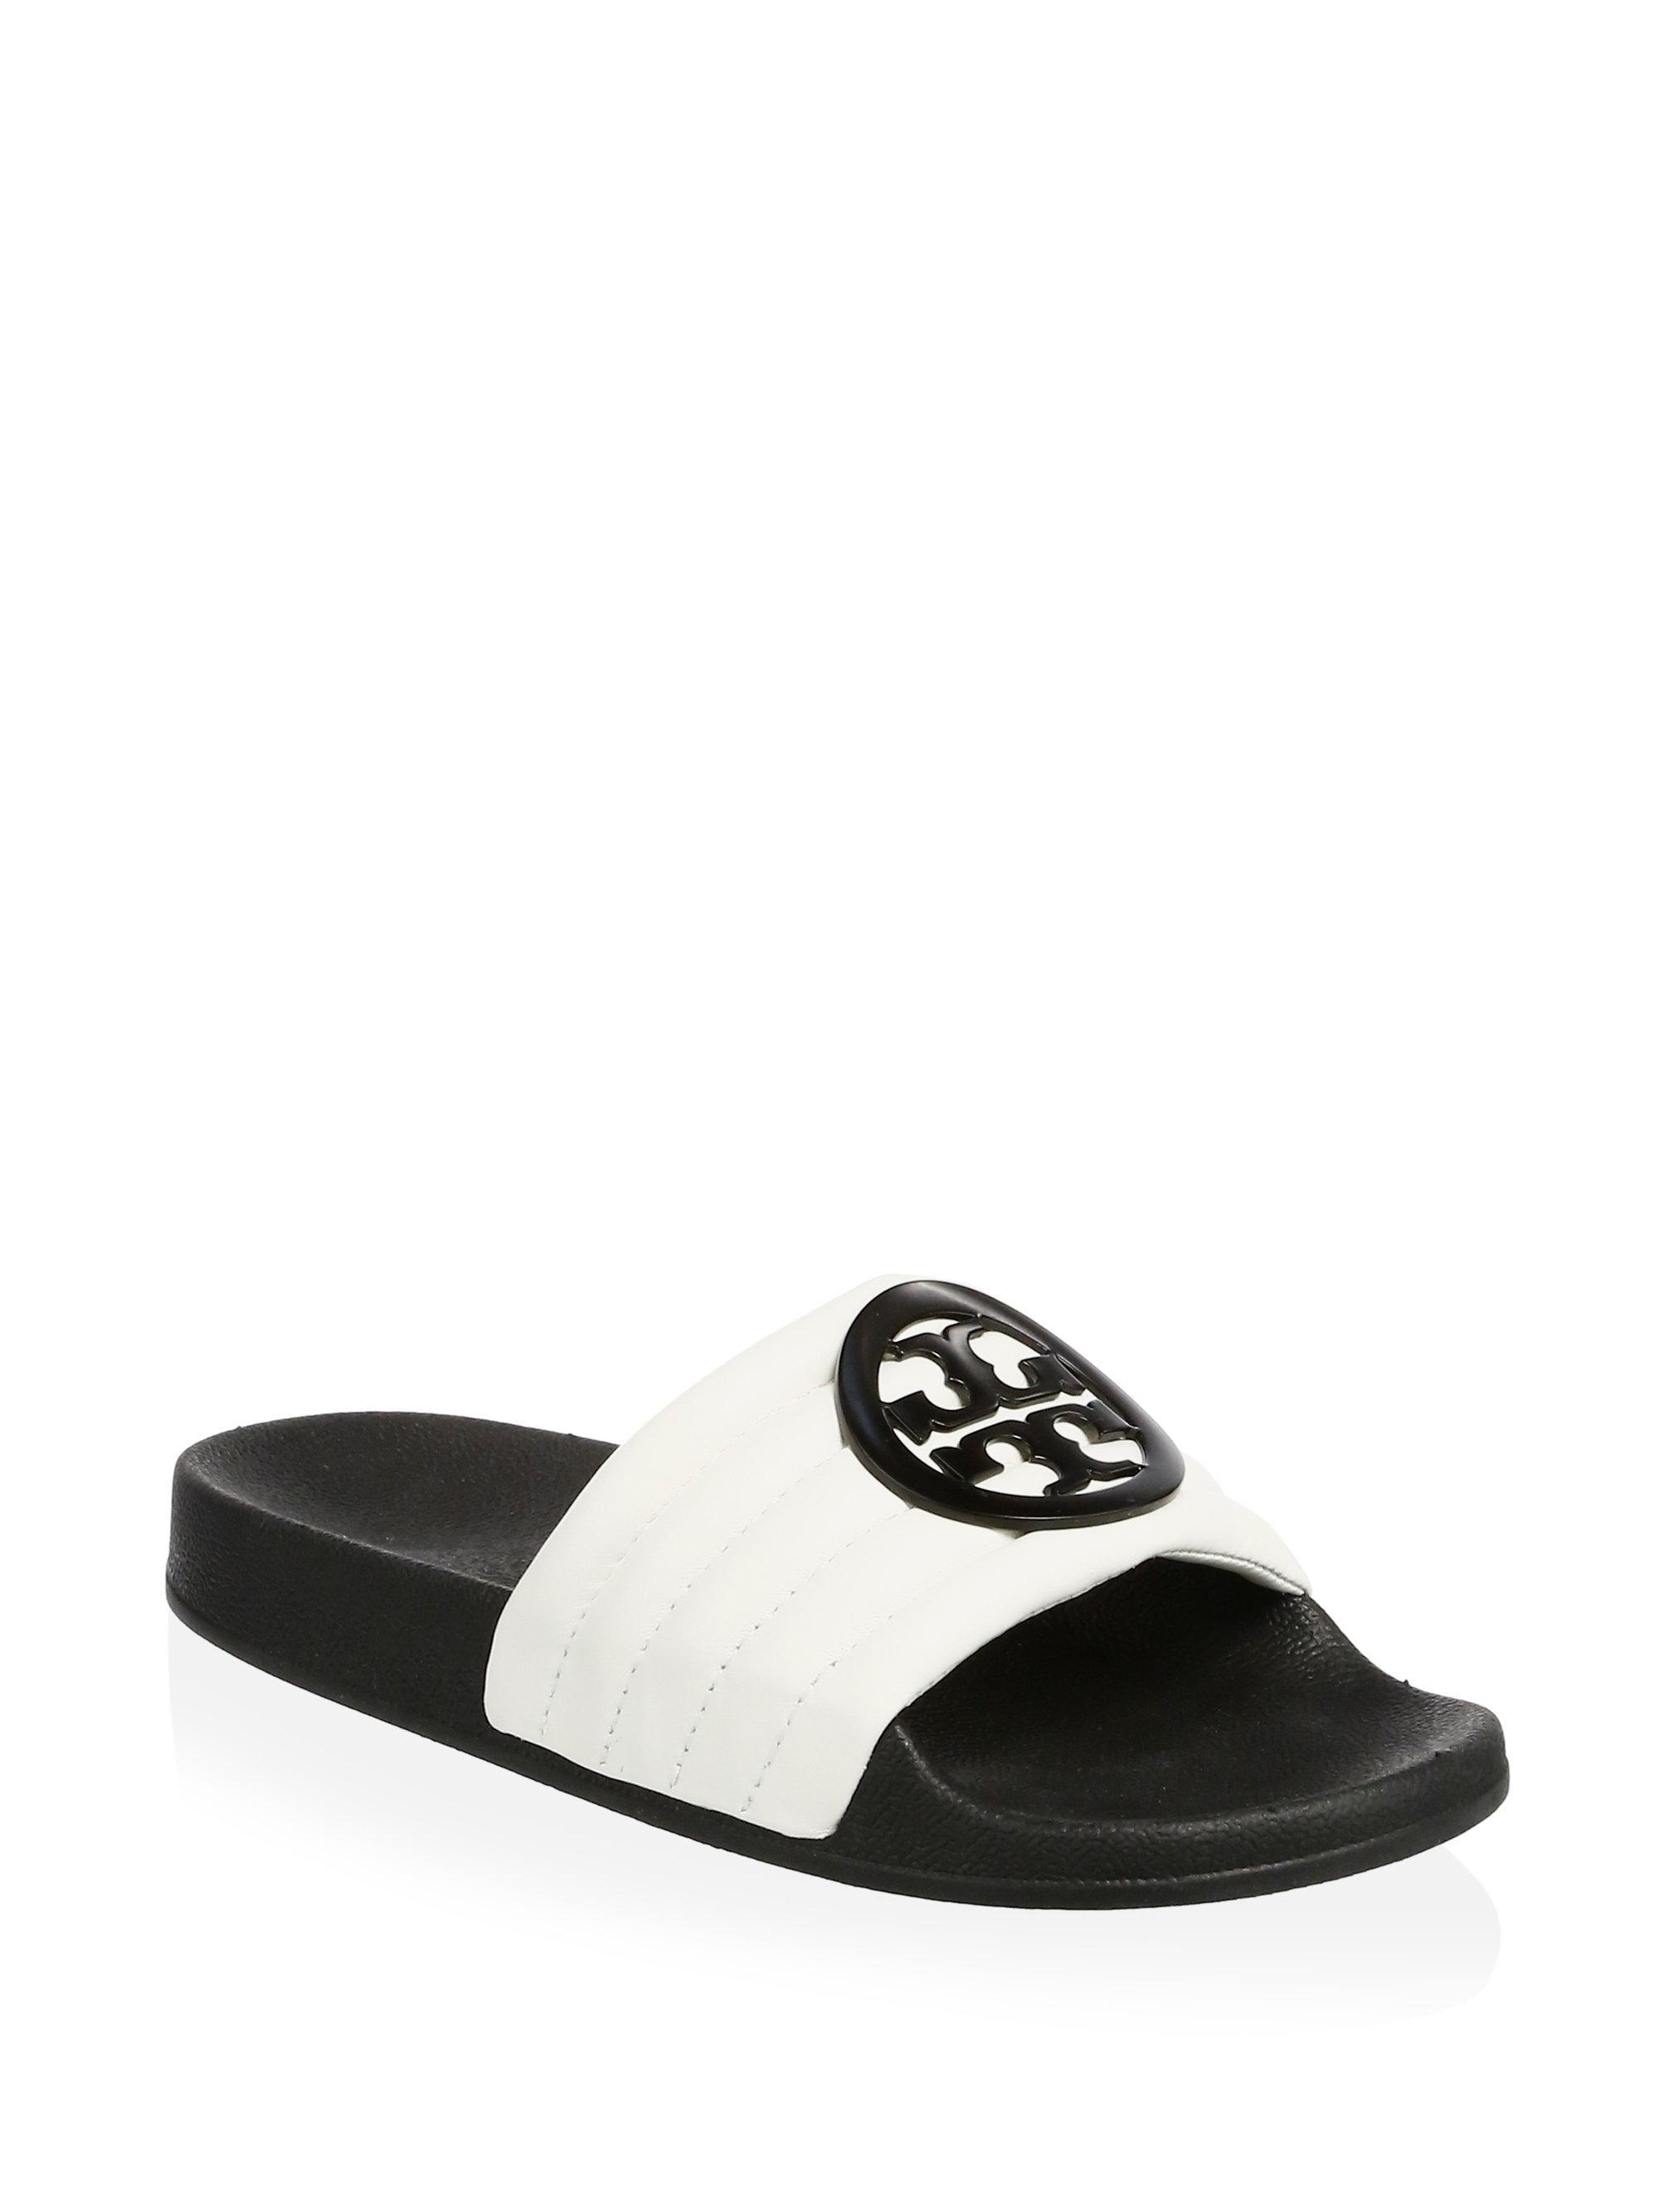 Tory Burch Lina Padded Slide Sandals Gyg6IV